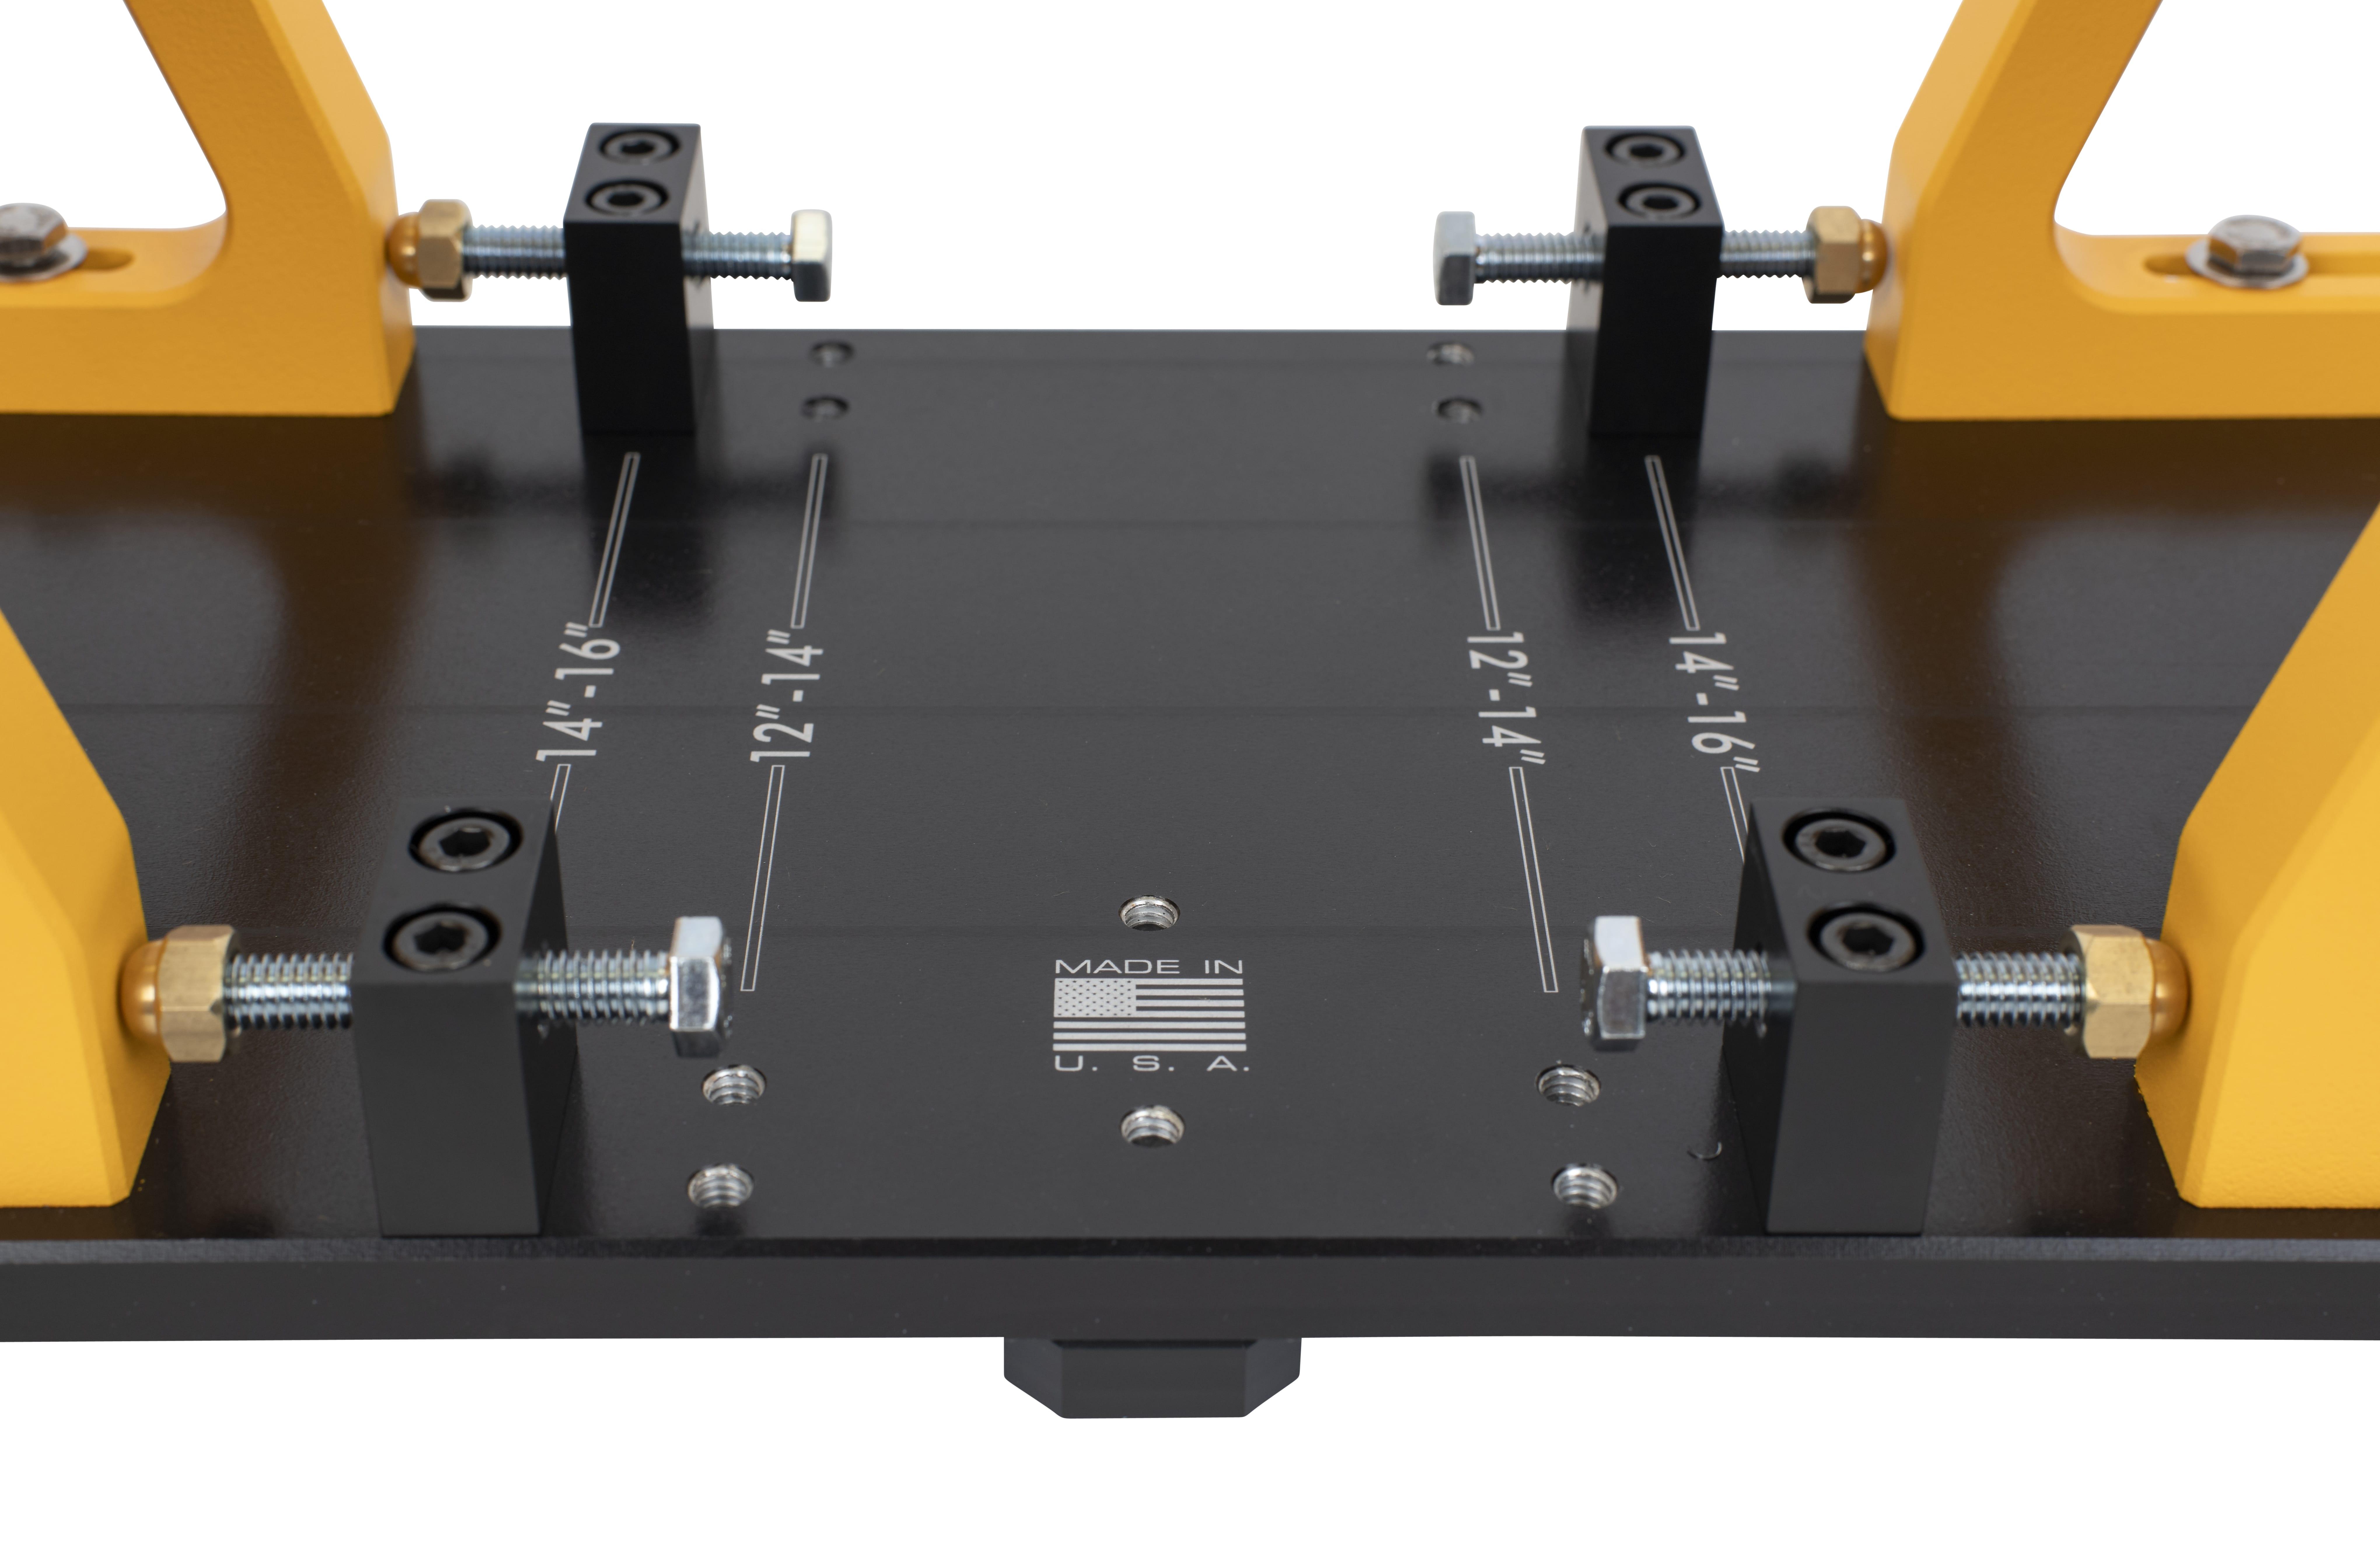 Alignment & Belt Tensioning Trainer KX-6550-ST